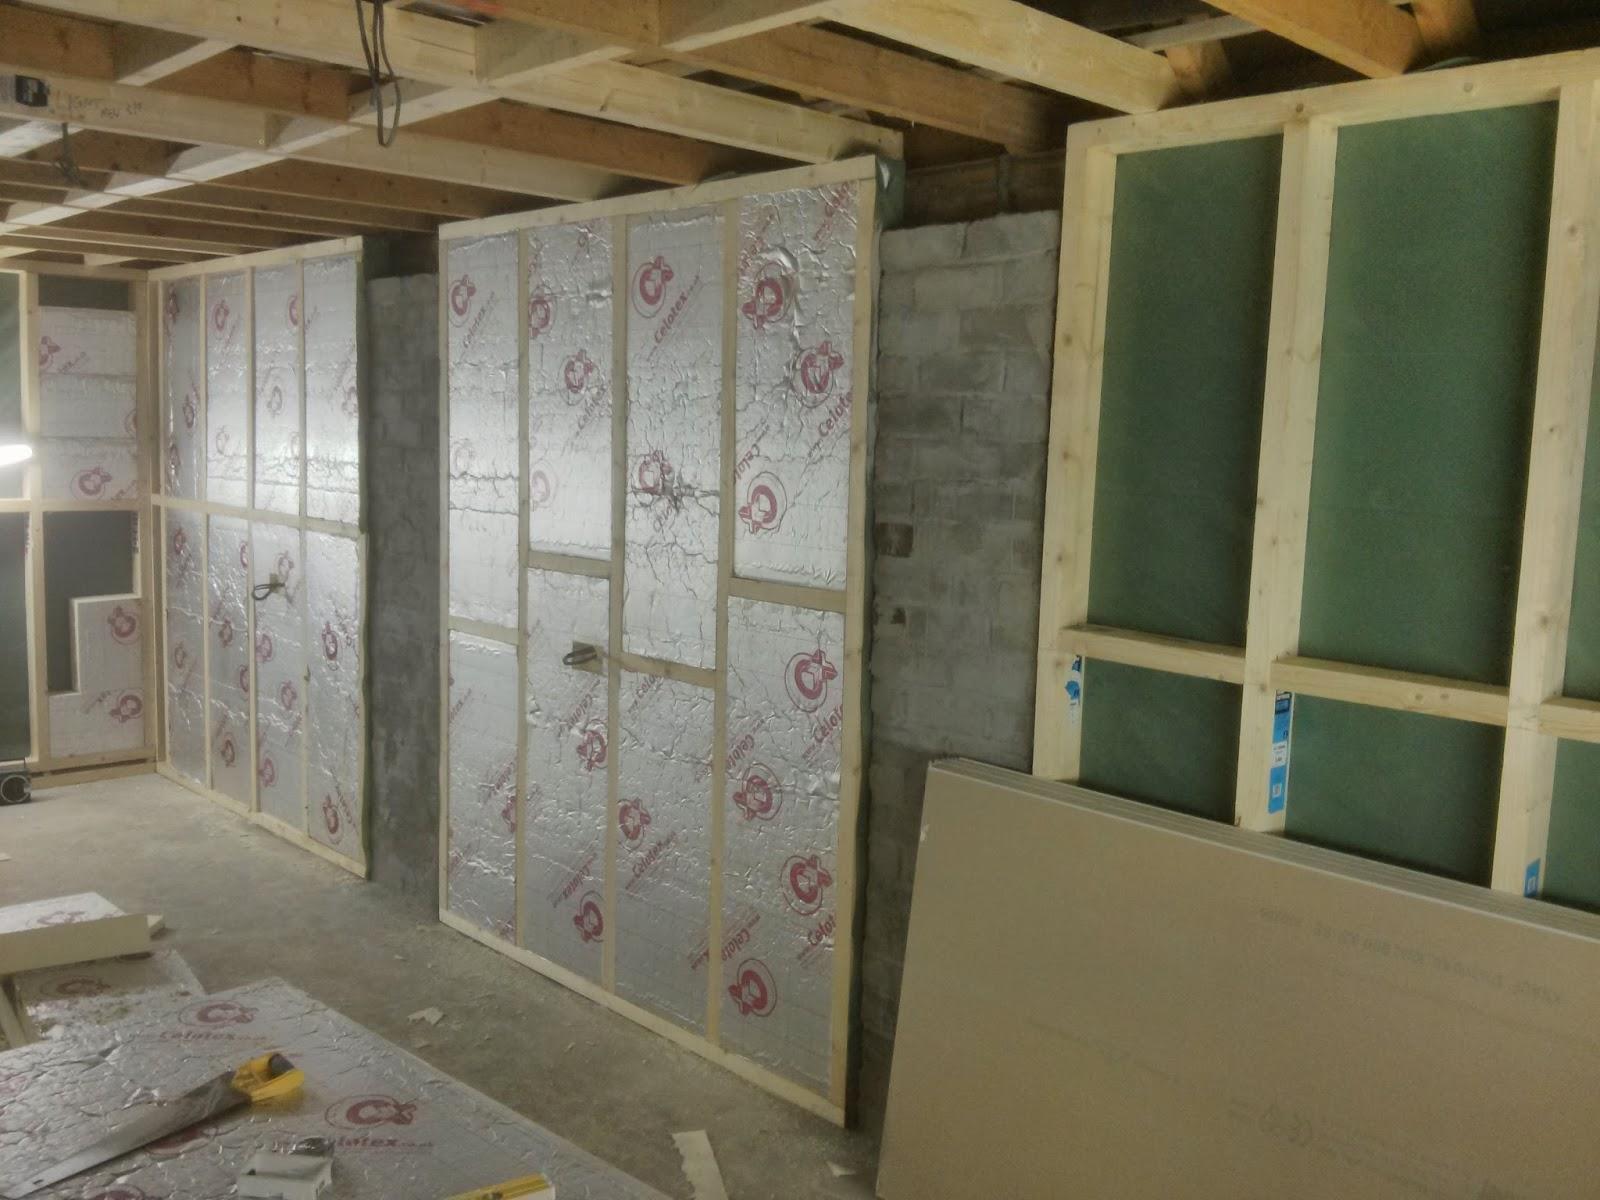 Grogley Junction: The Garage (Modelling Room) update